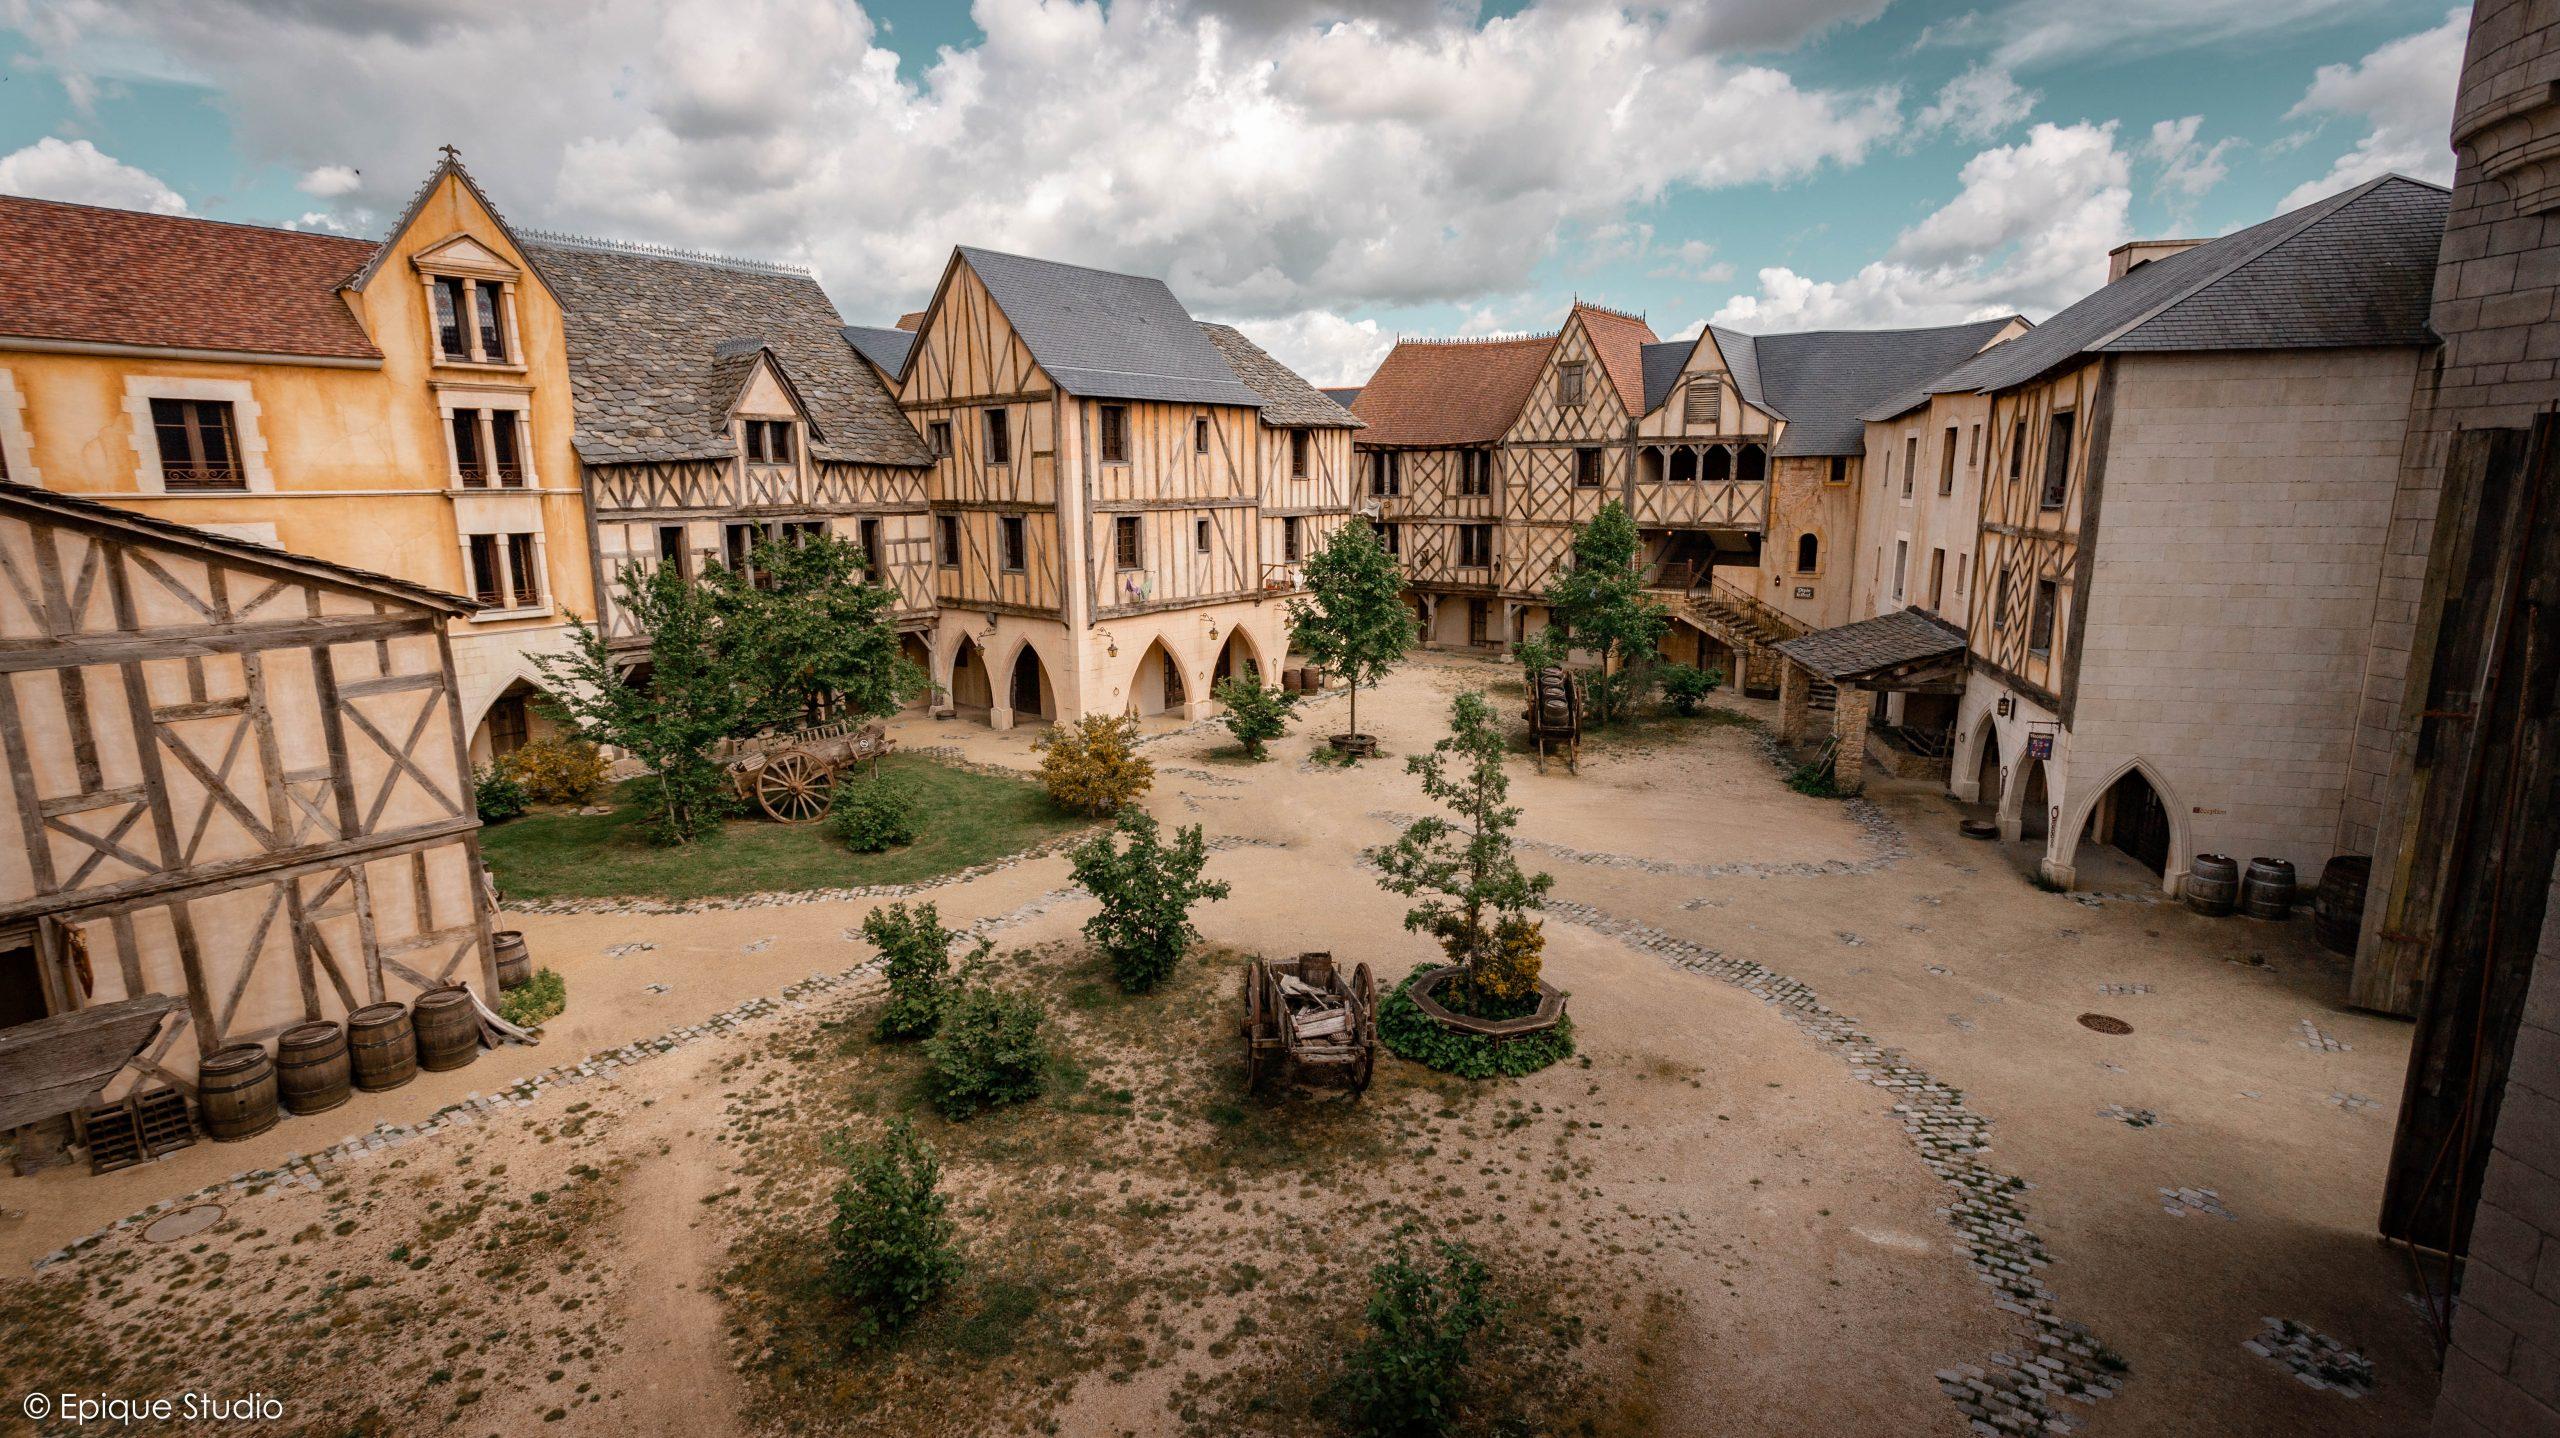 La Ctiadelle - Puy du Fou